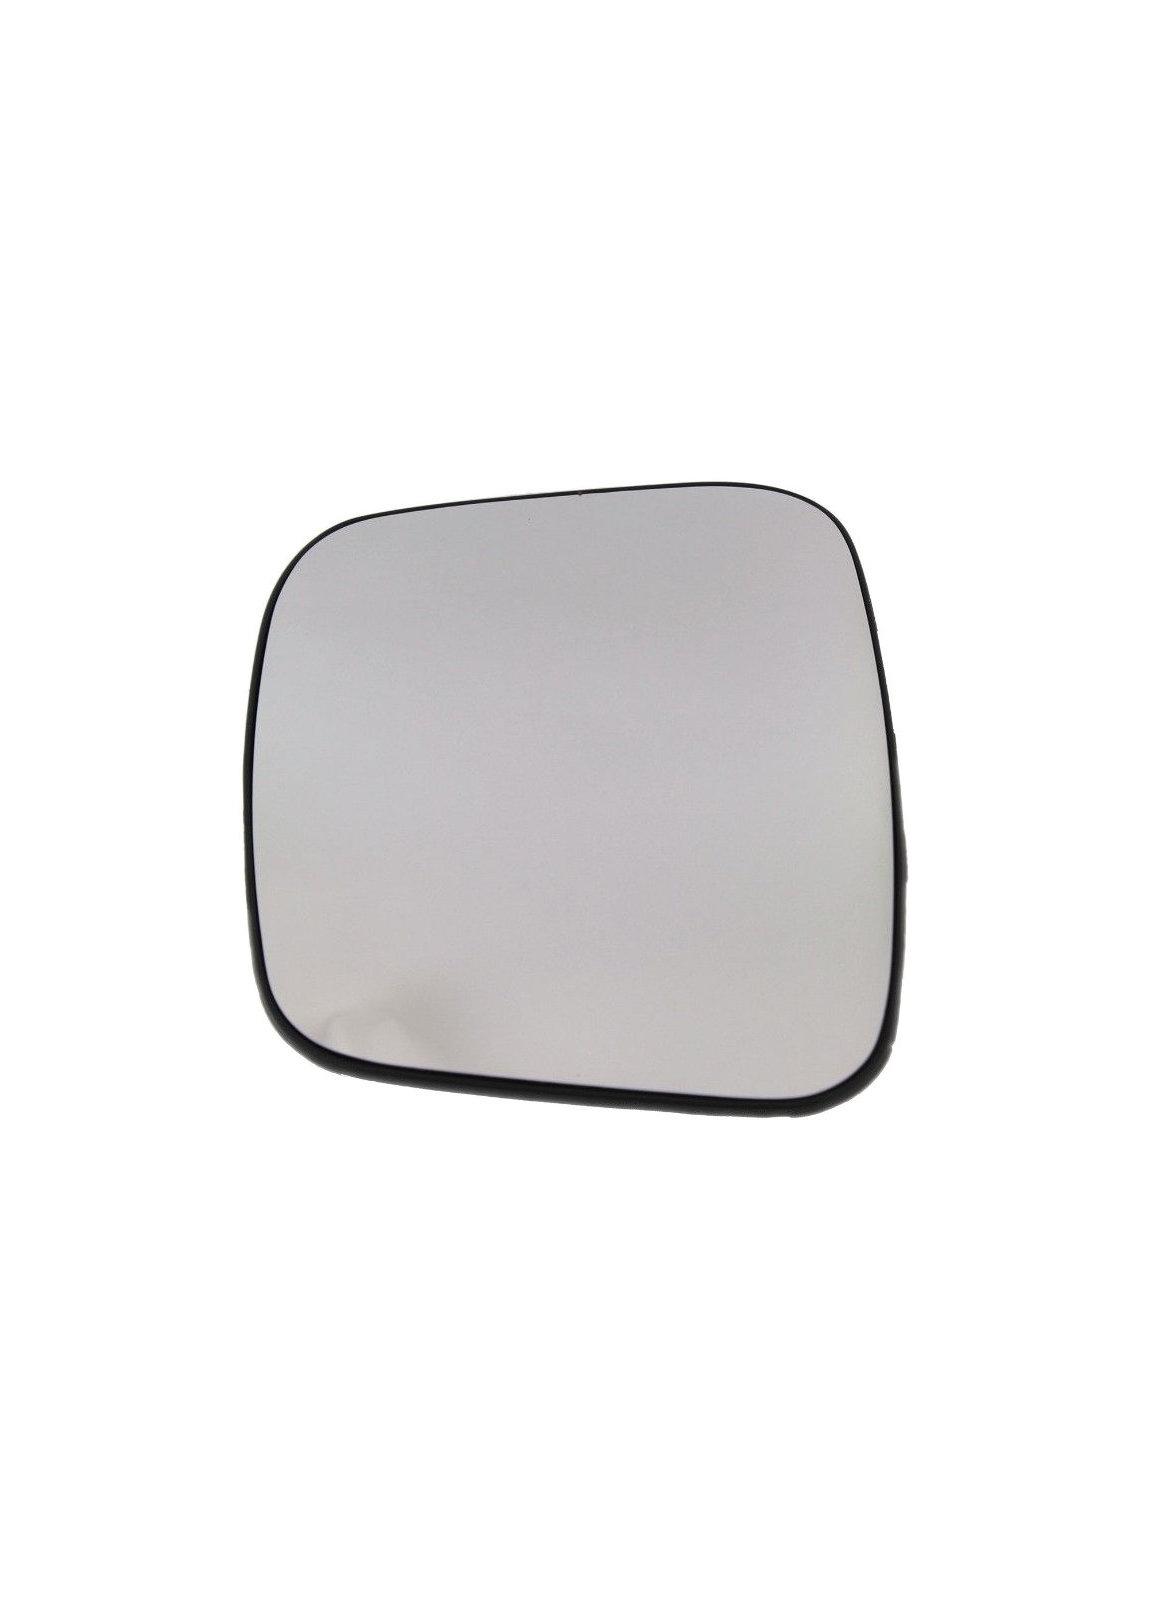 Geam oglinda Citroen Nemo (Aa), 10.2007-, Fiat Fiorino/Qubo, 10.2007-, Fiat Fiorino/Qubo, 10.2007-, Peugeot Bipper, 10.2007-, partea Dreapta, culoare sticla crom, sticla convexa, cu incalzire